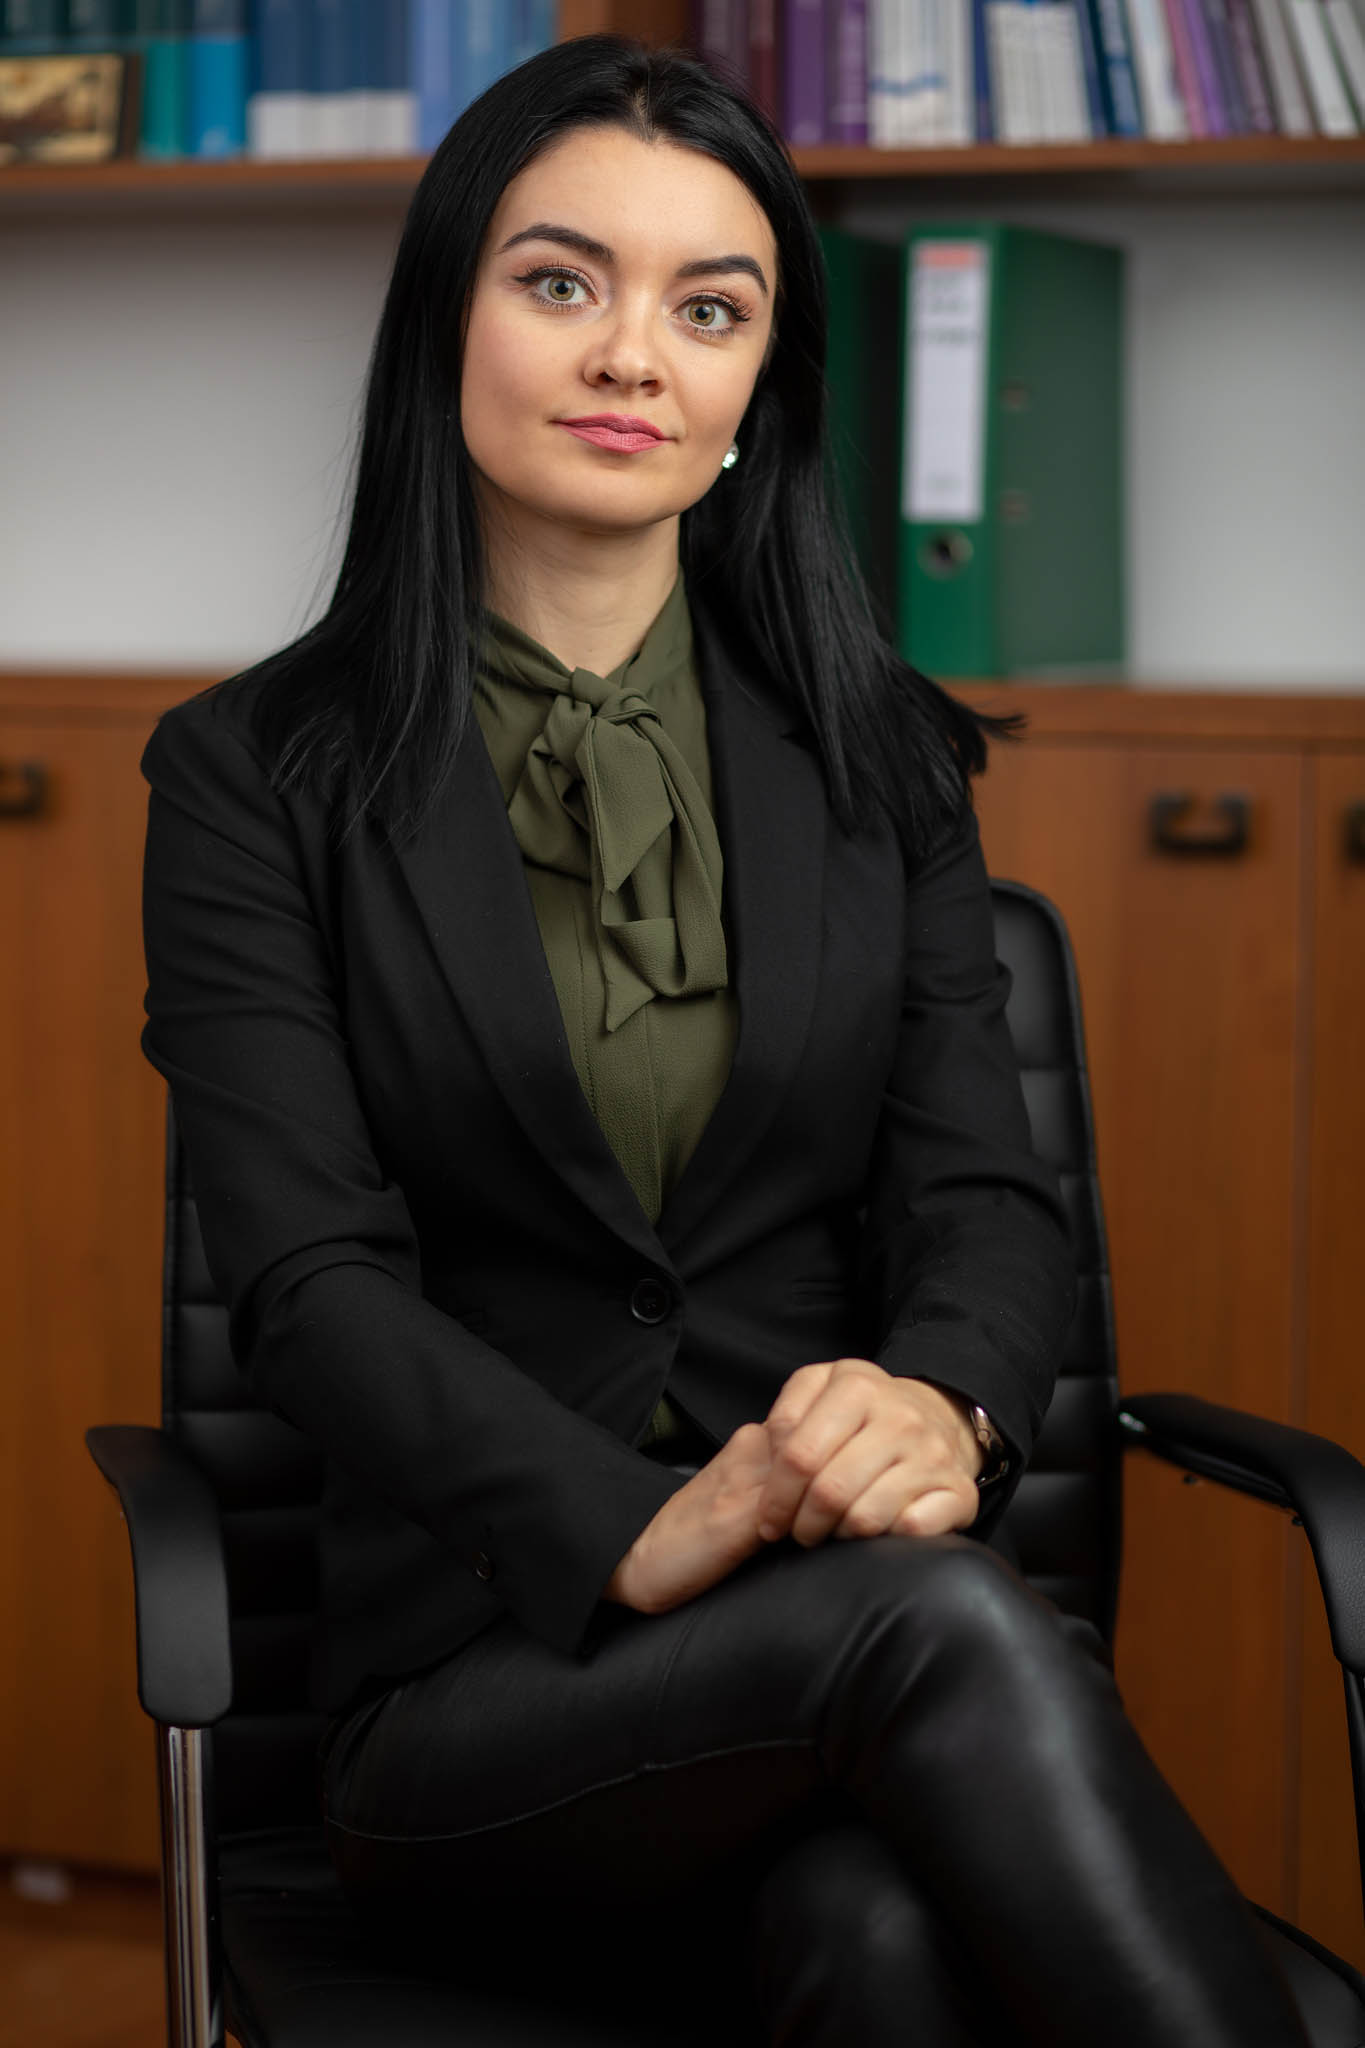 Ema Patrascu